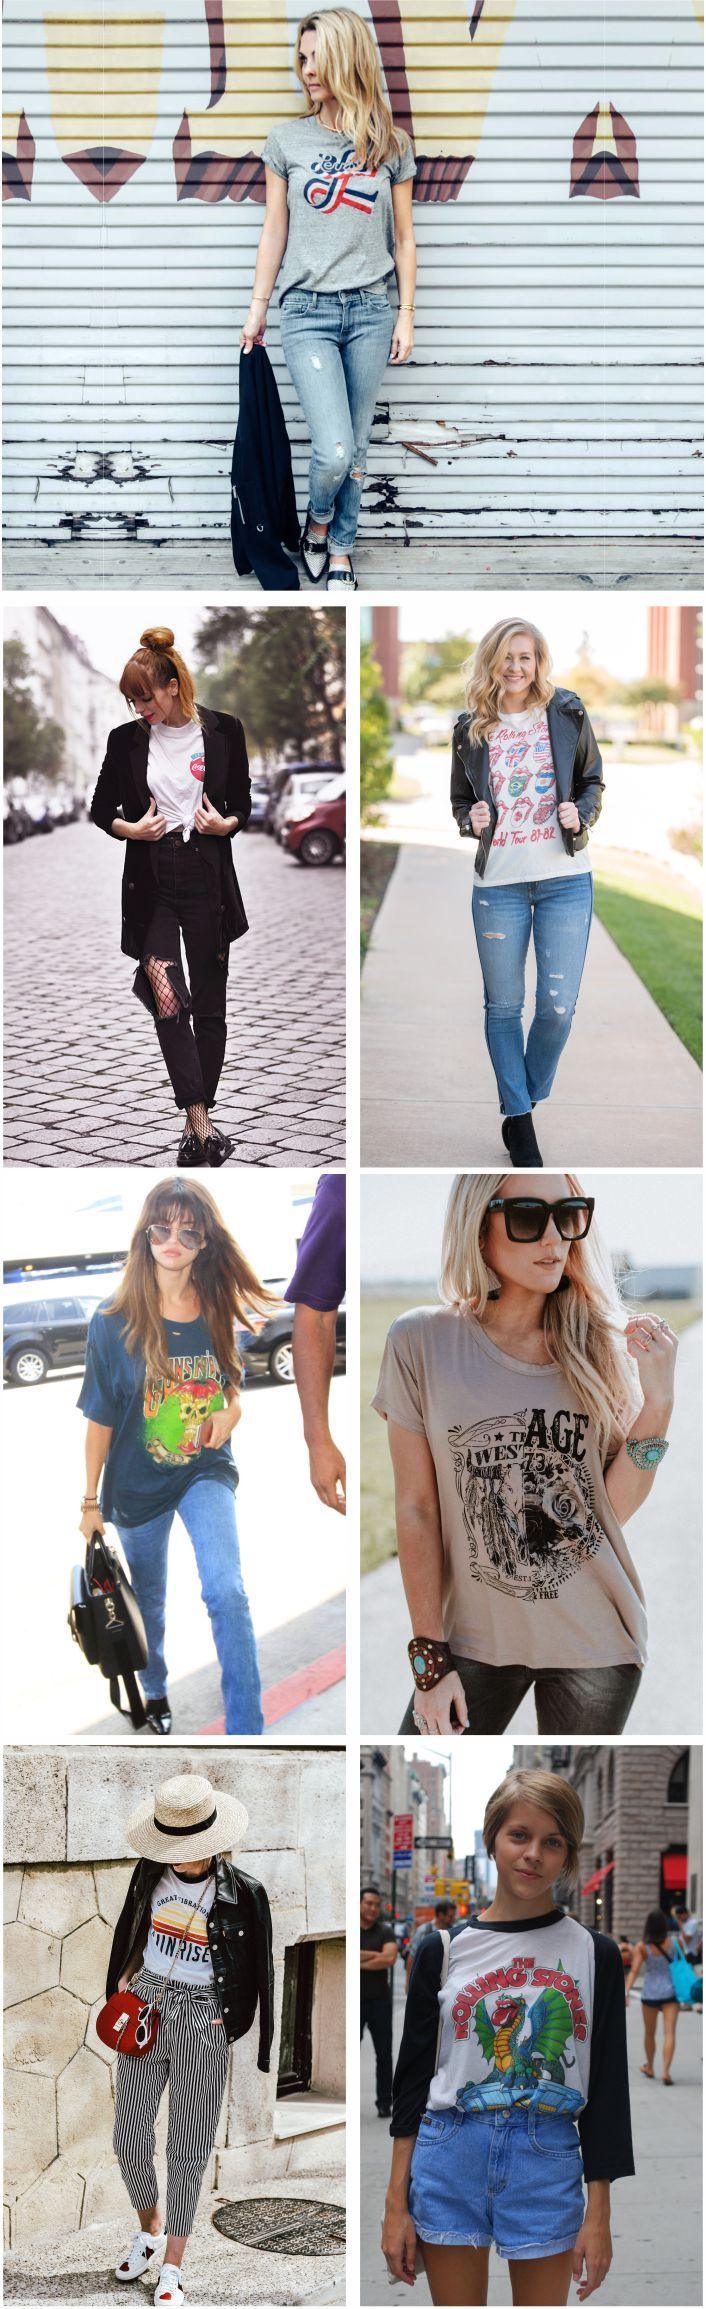 Como usar t-shirt vintage